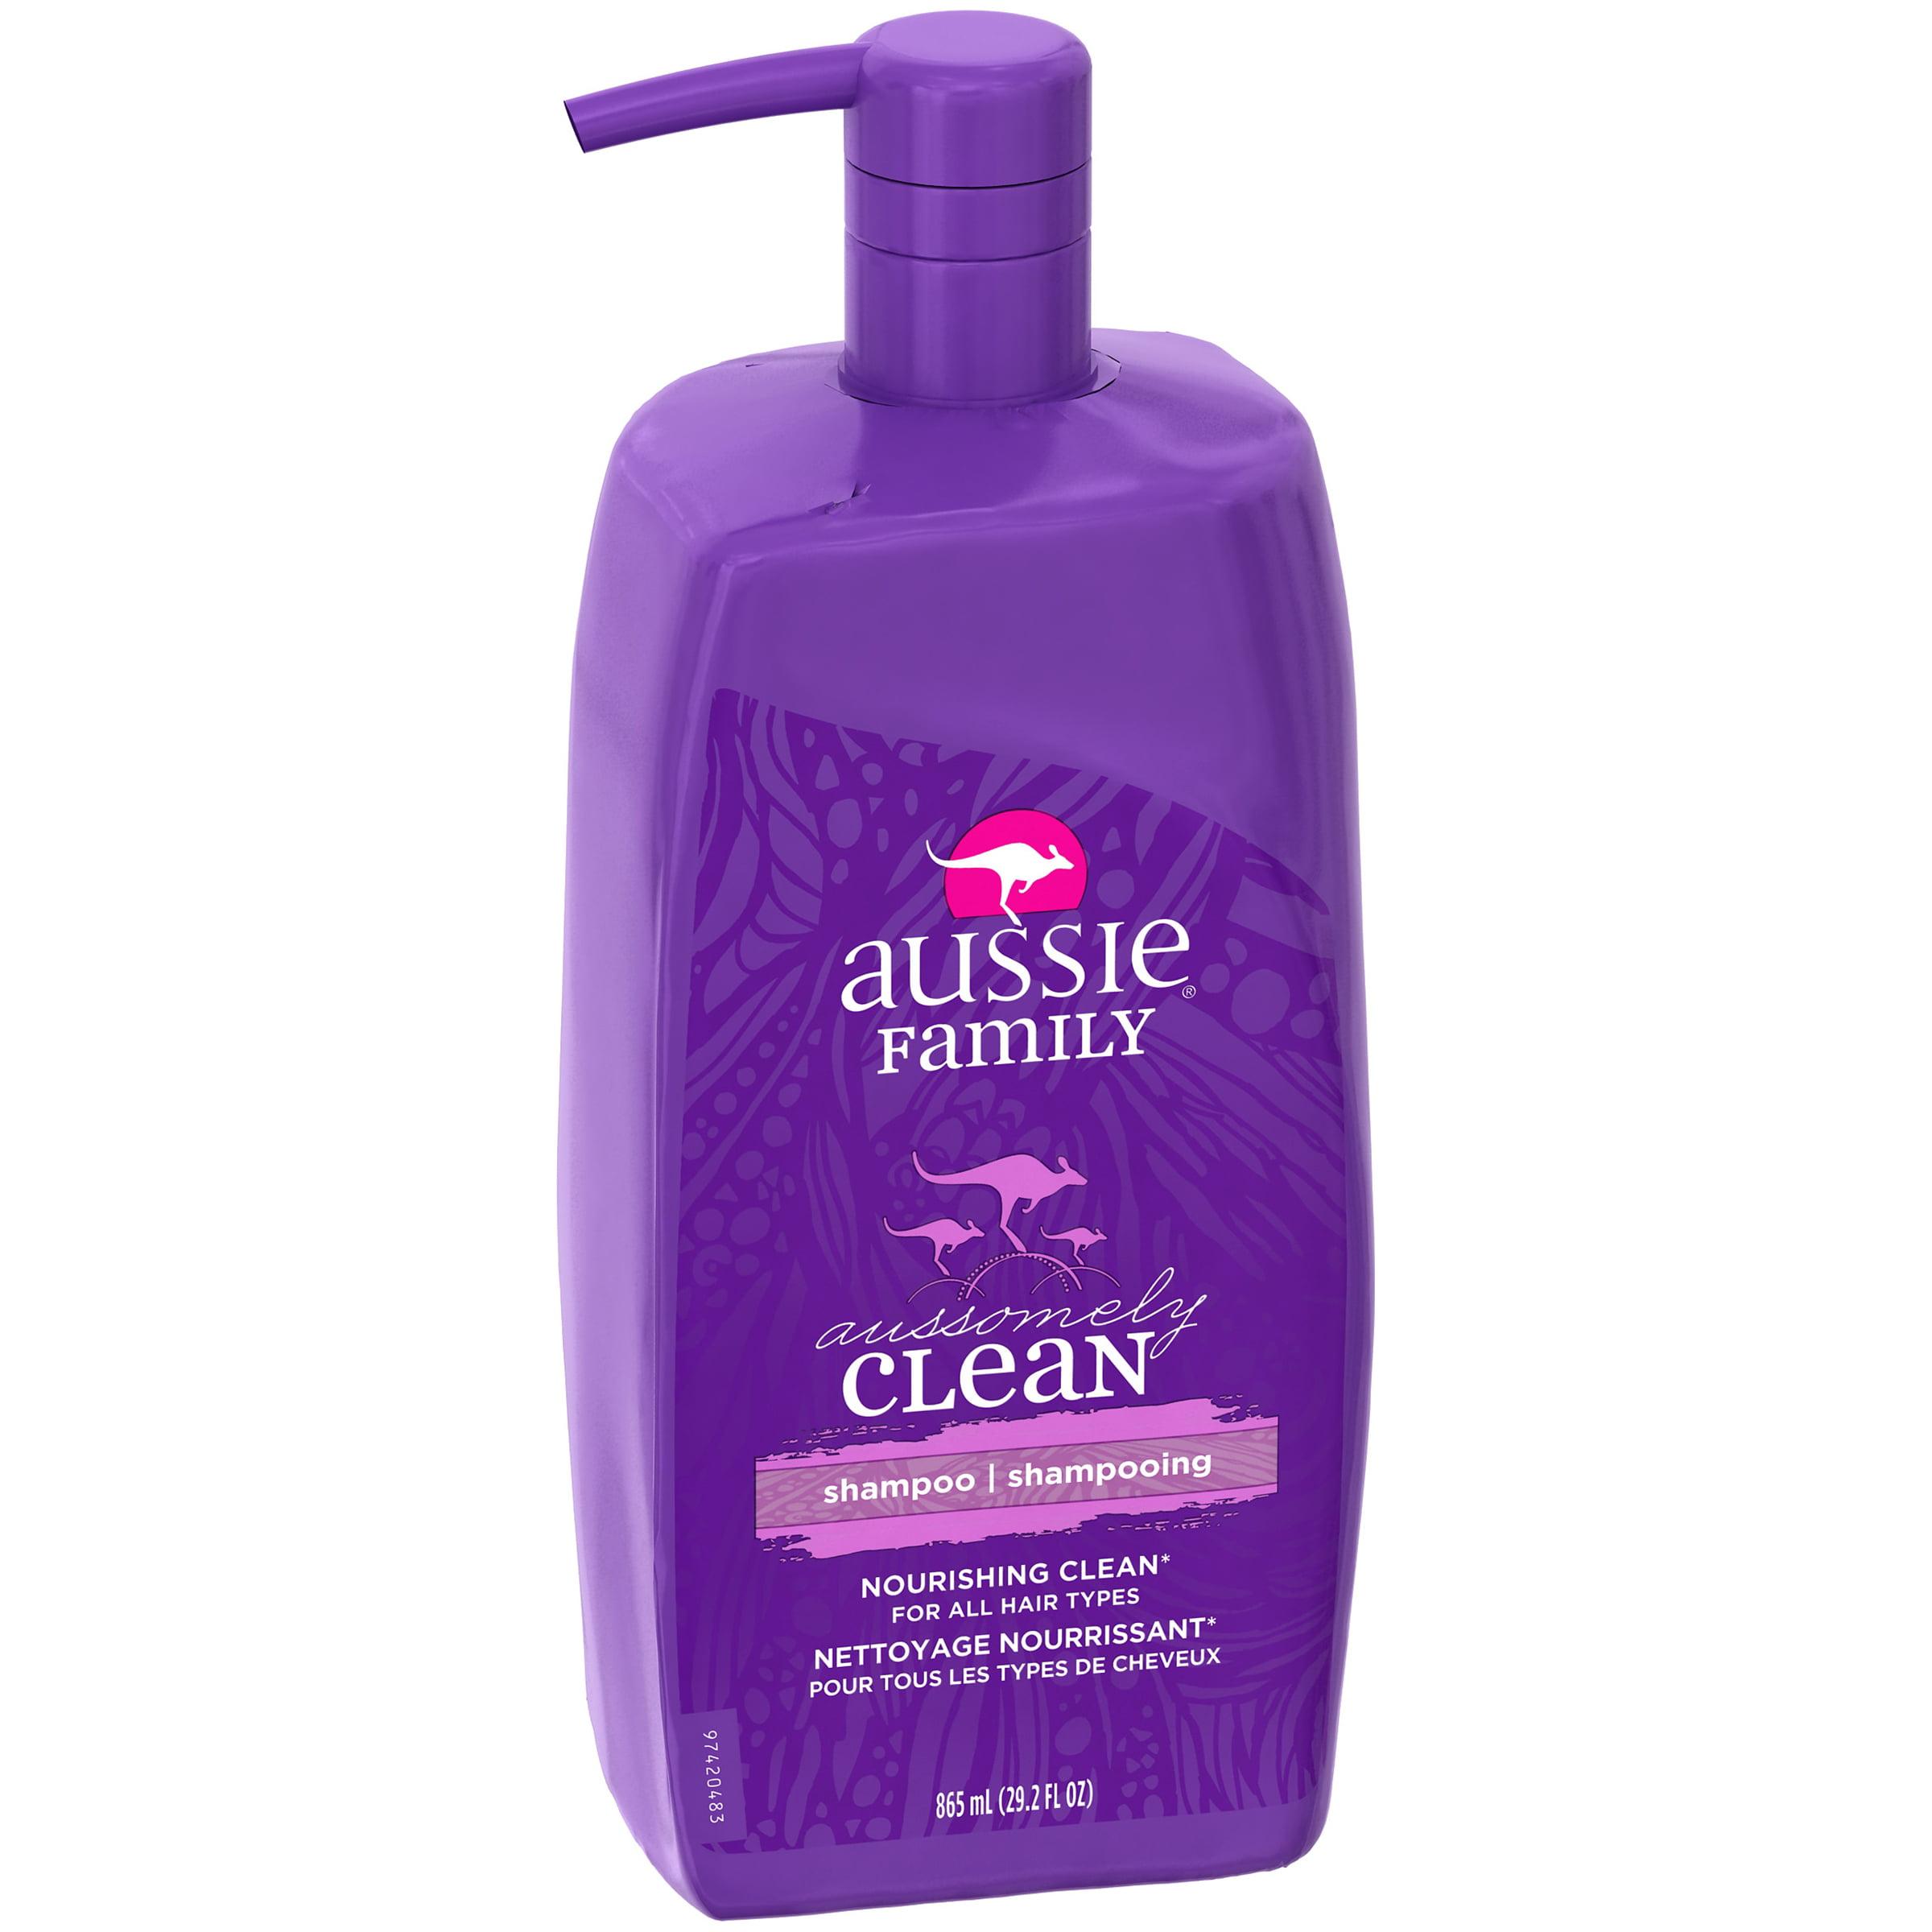 aussie aussomely clean family shampoo 29 2 fl oz walmart com